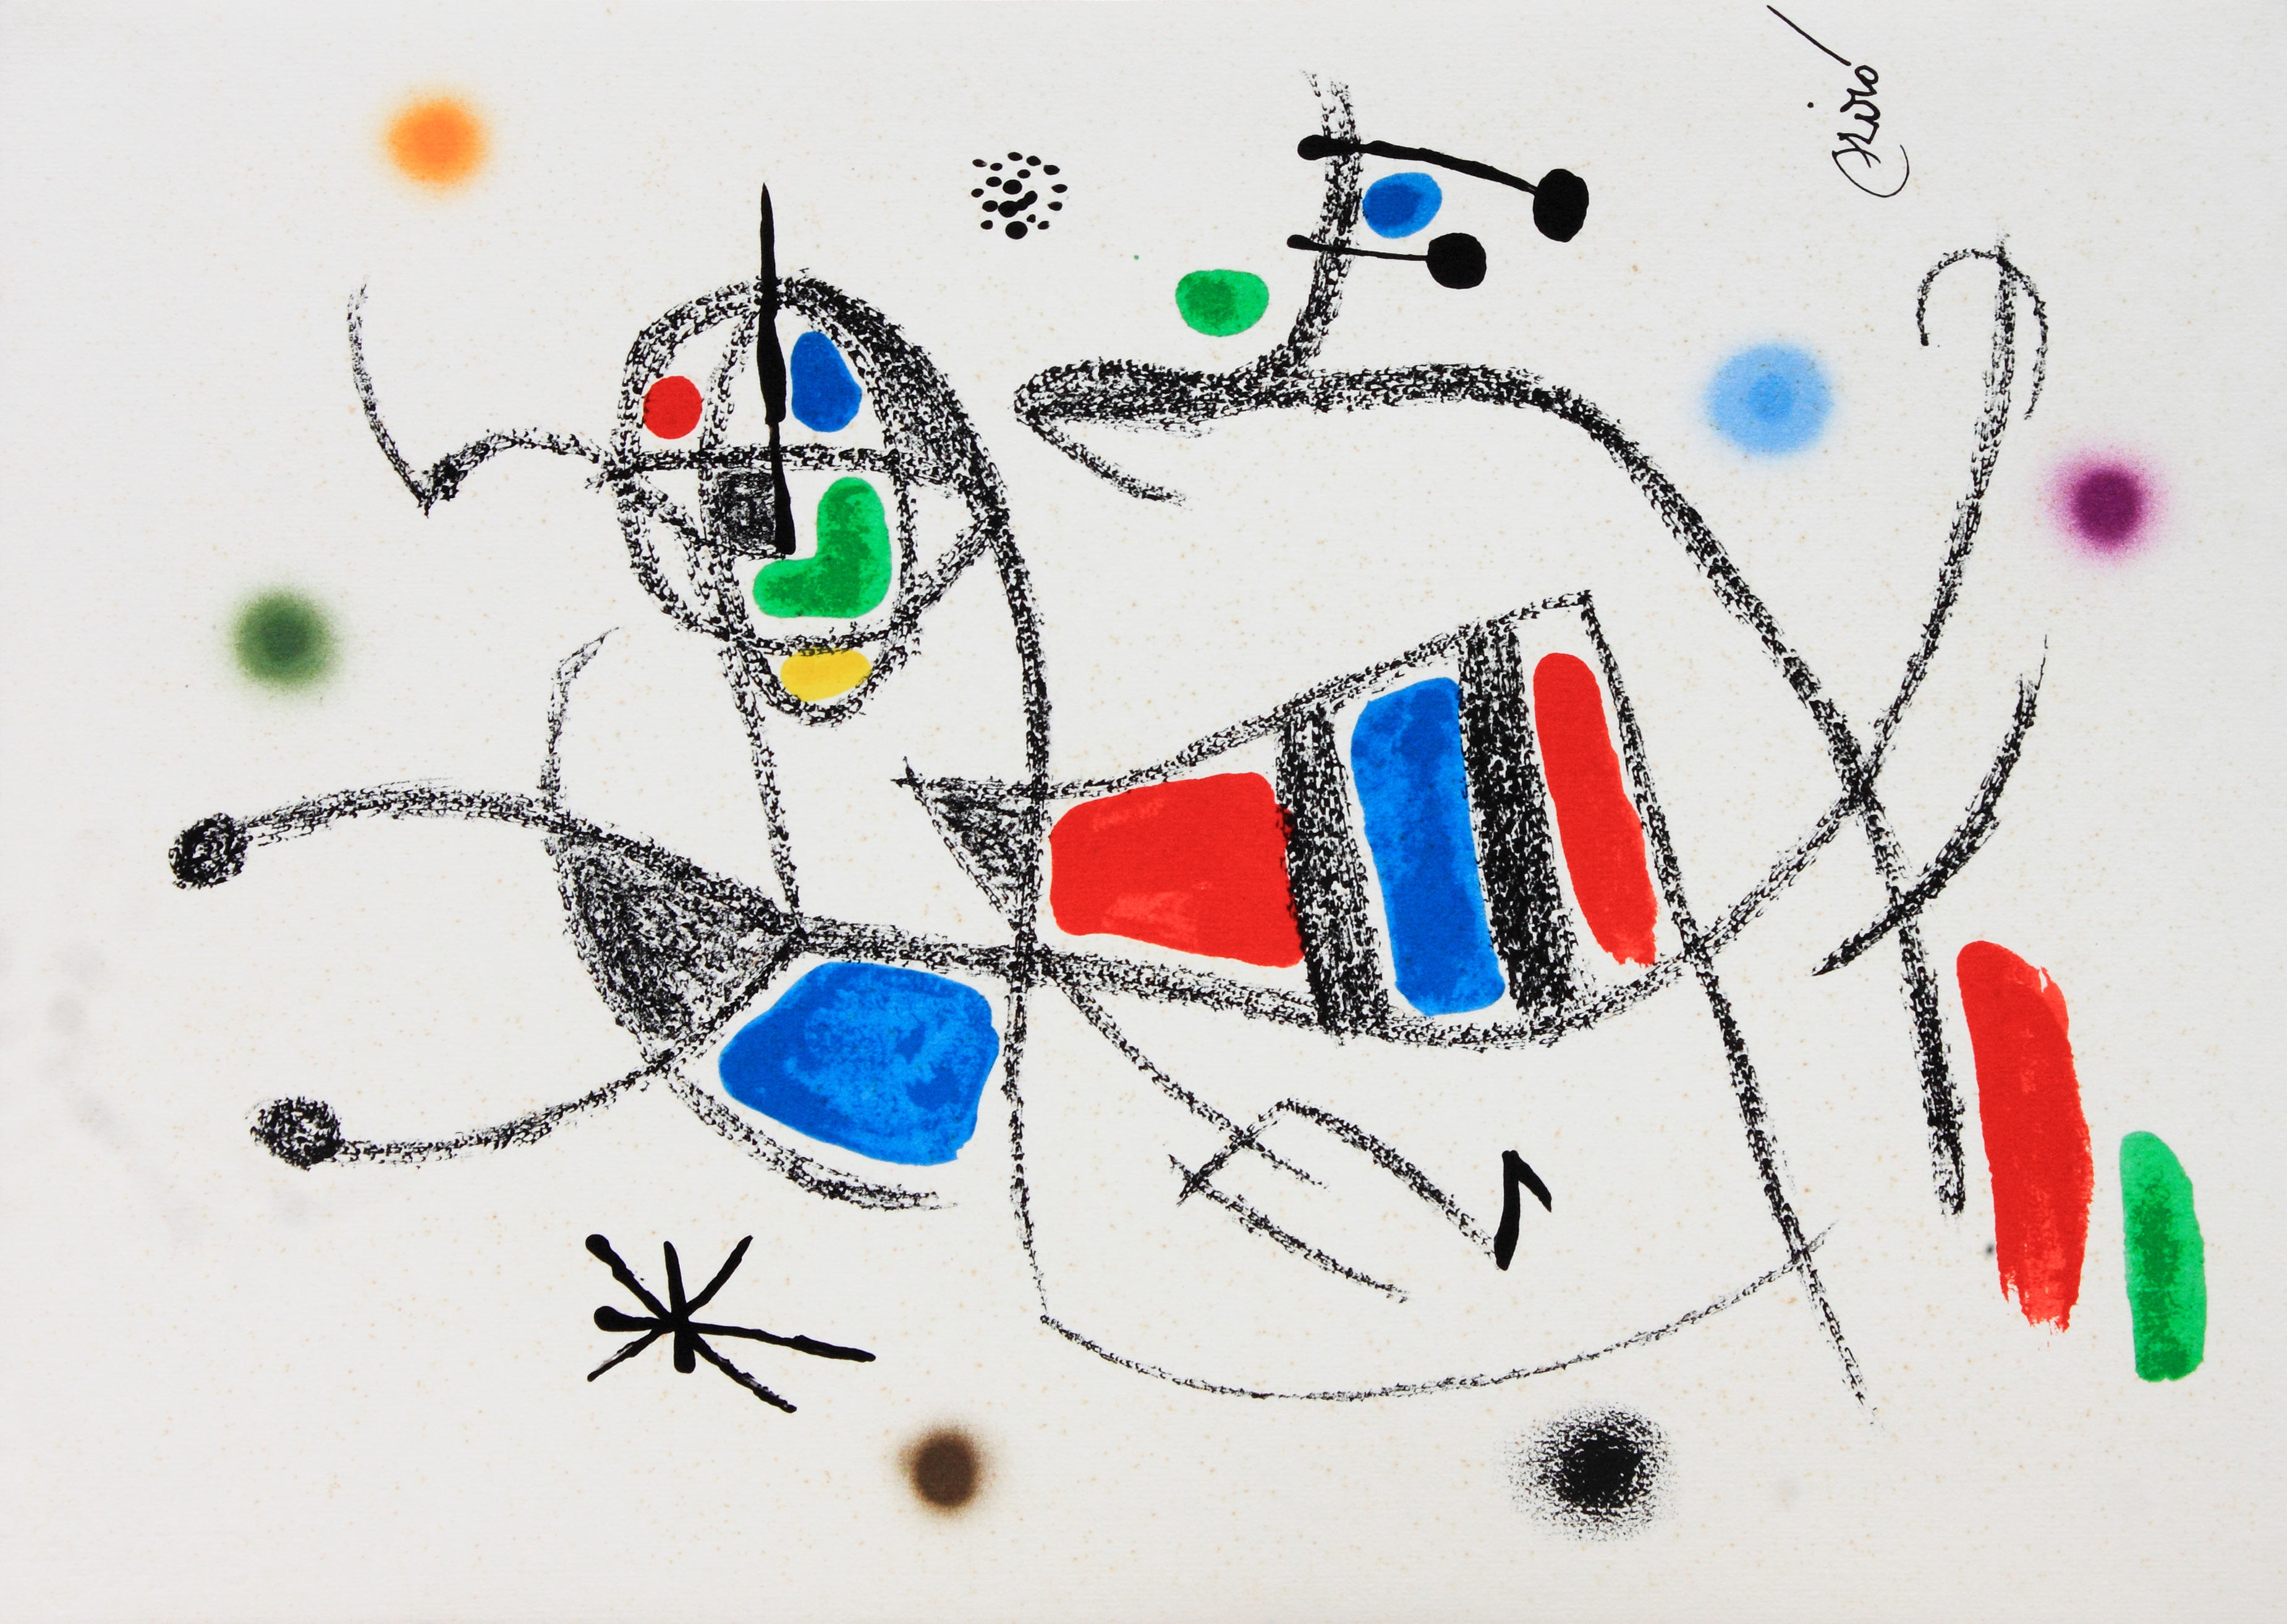 O Jardim das Maravilhas de Miró SP